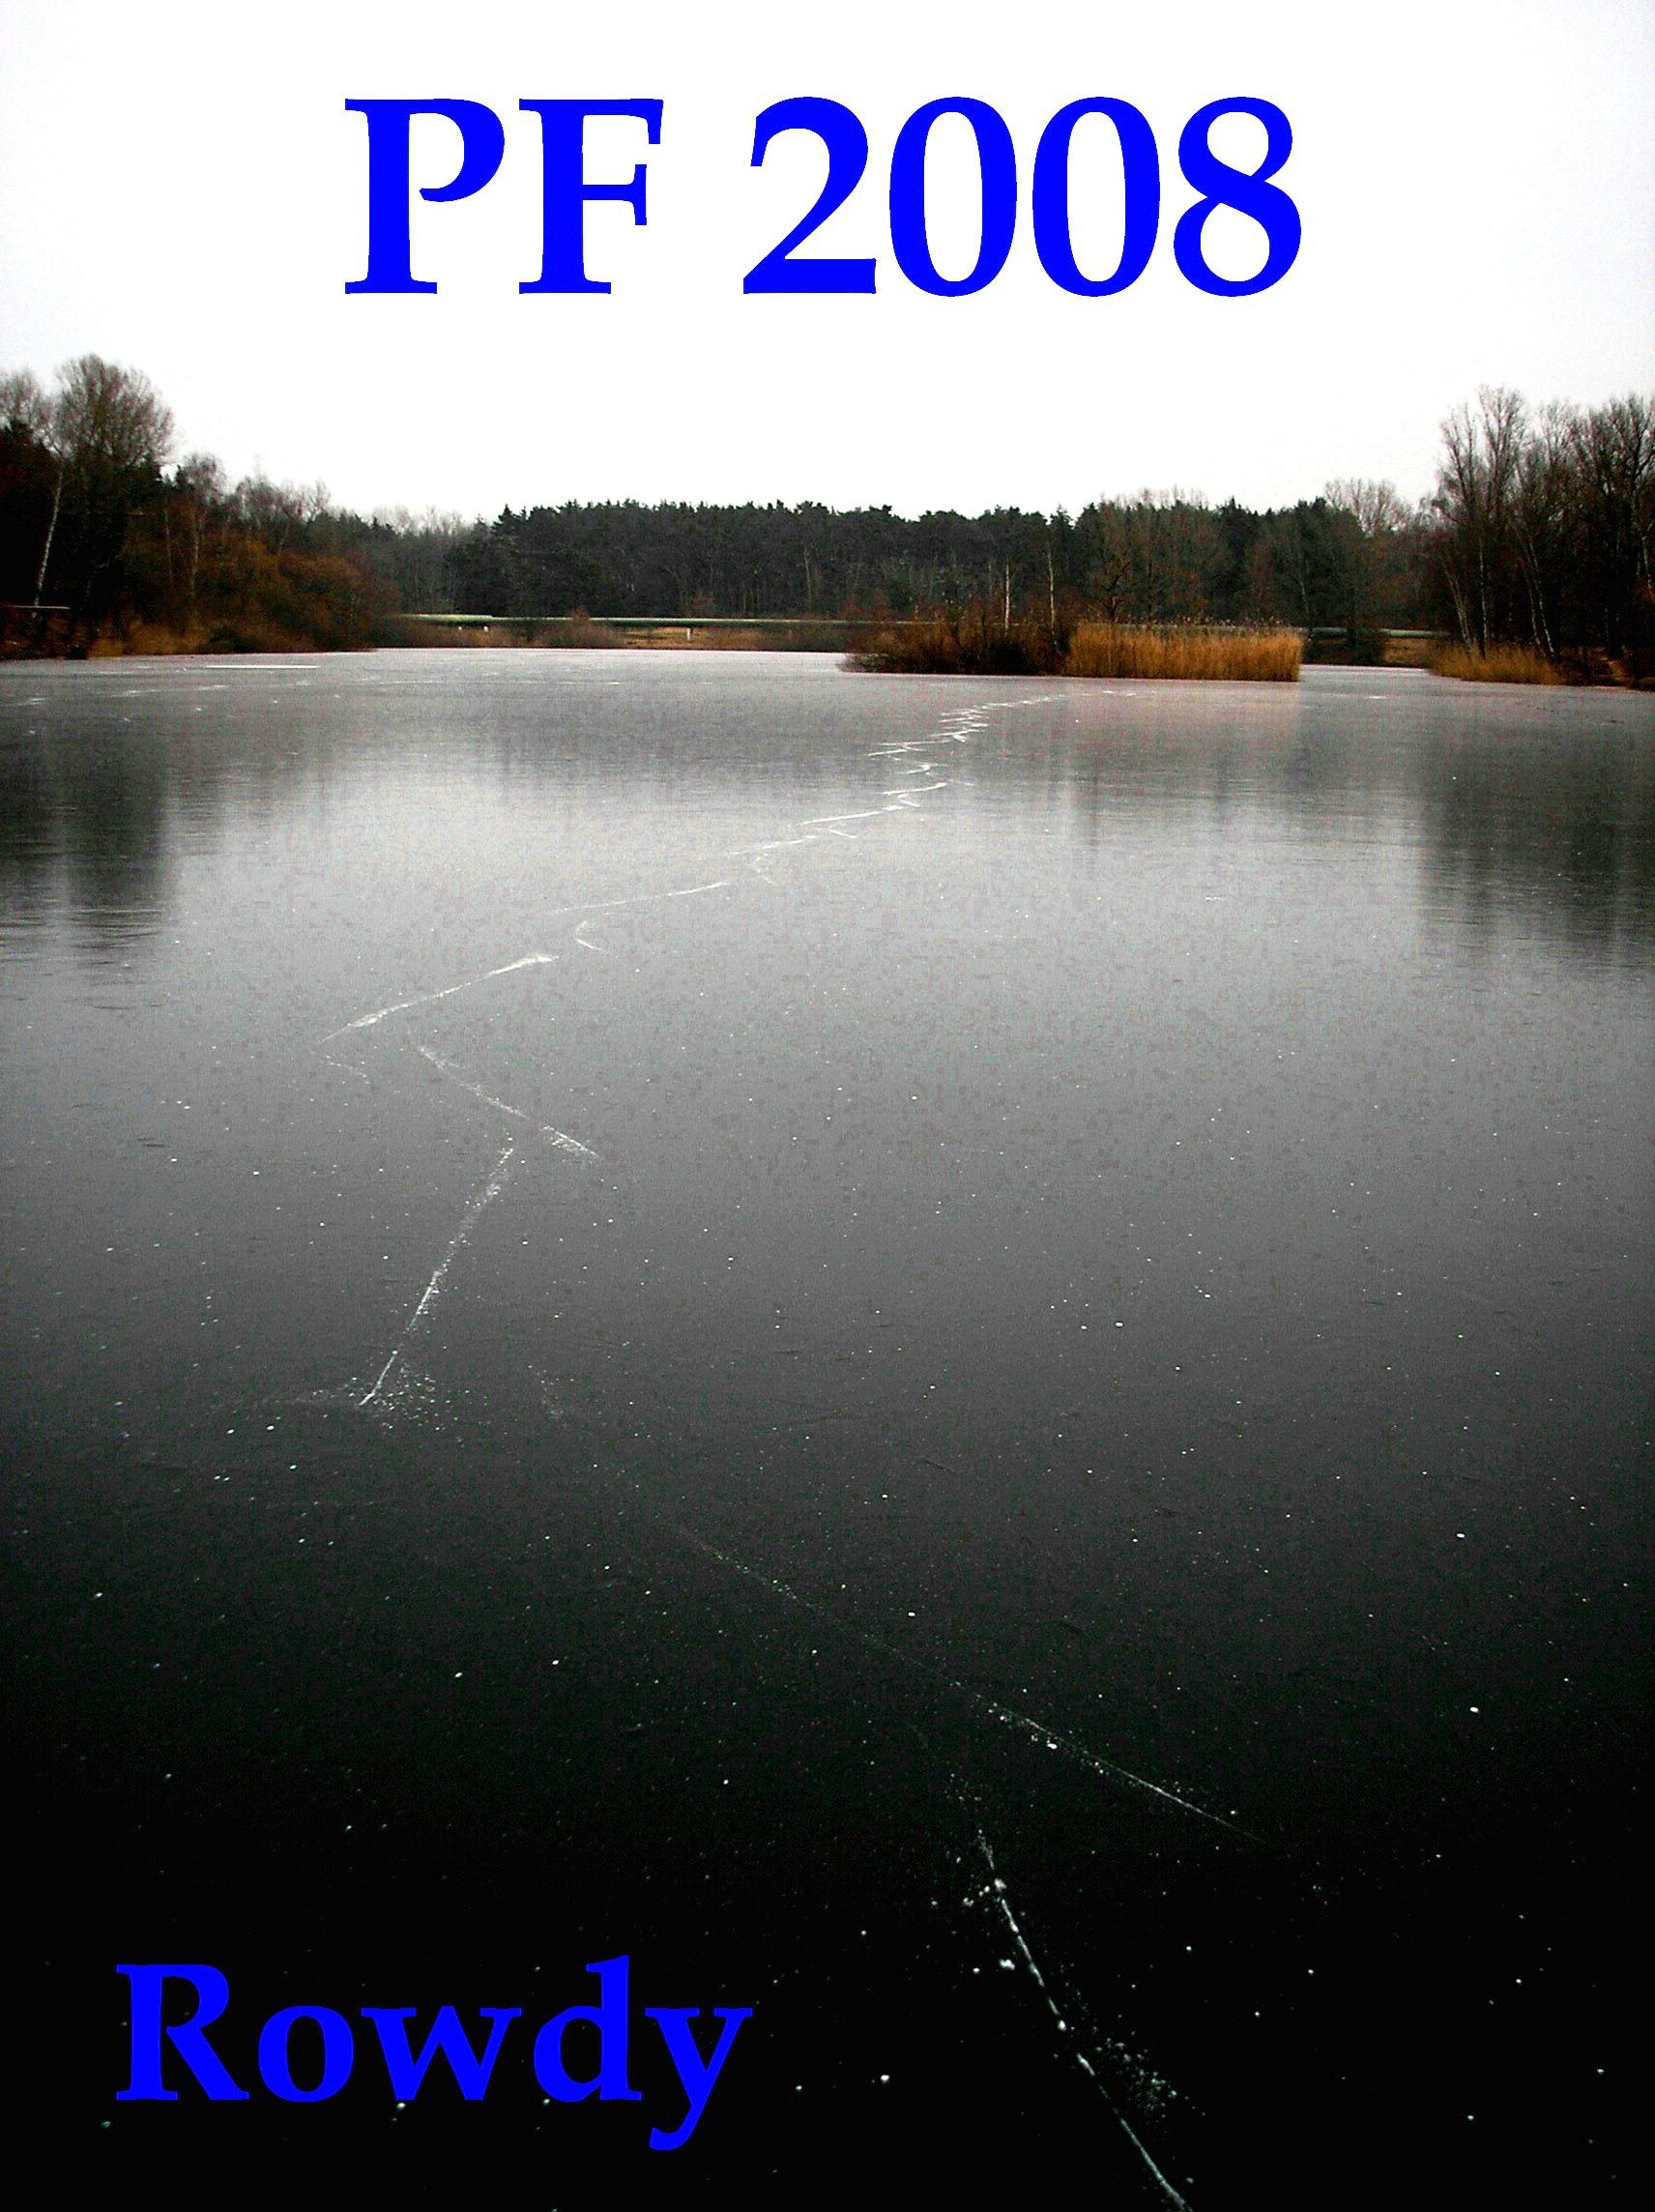 pf2008r.jpg